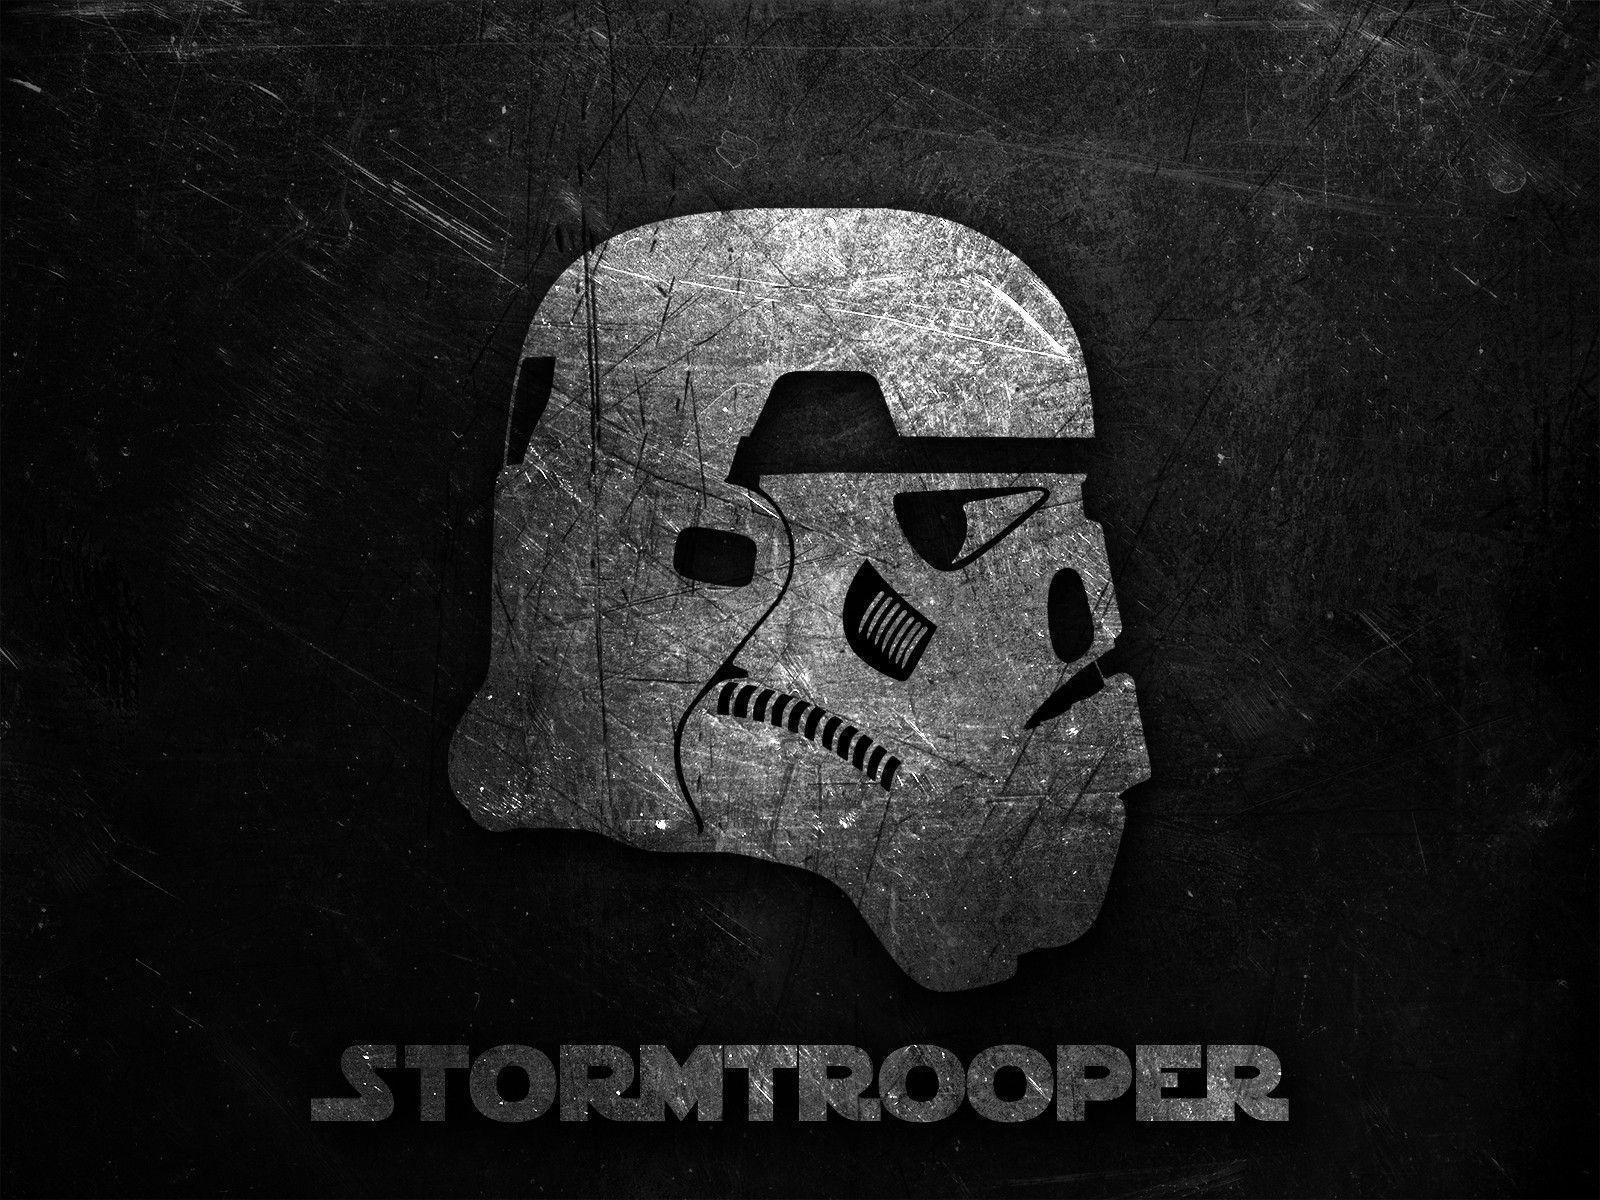 Artwork Head Metal Star Wars Stormtroopers Textures